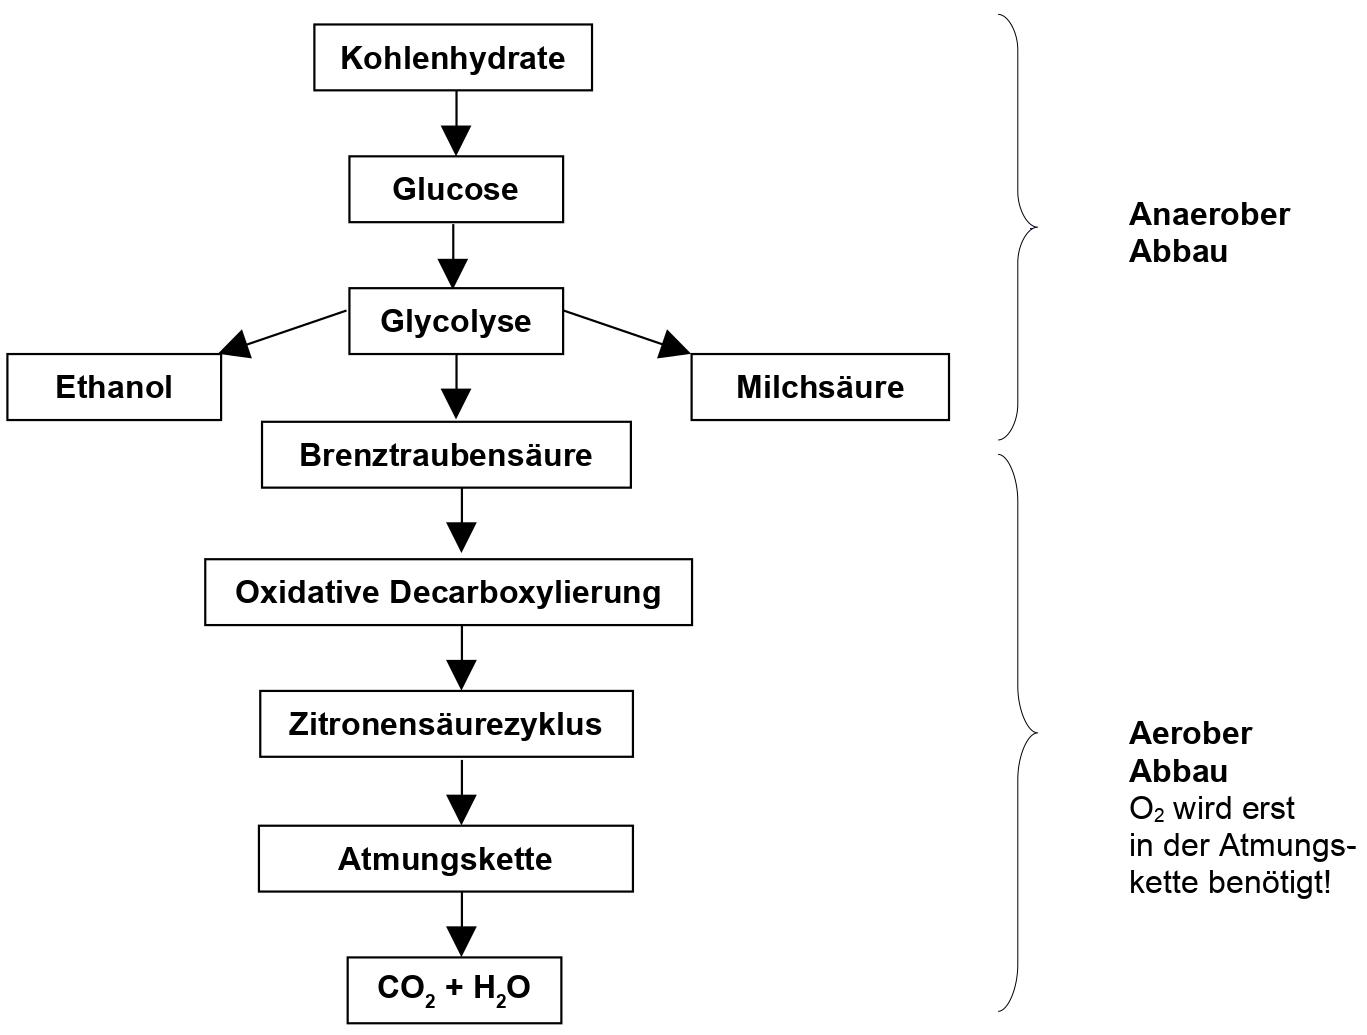 Freies Lehrbuch Biologie: 10.08 Zellatmung - Dissimilation